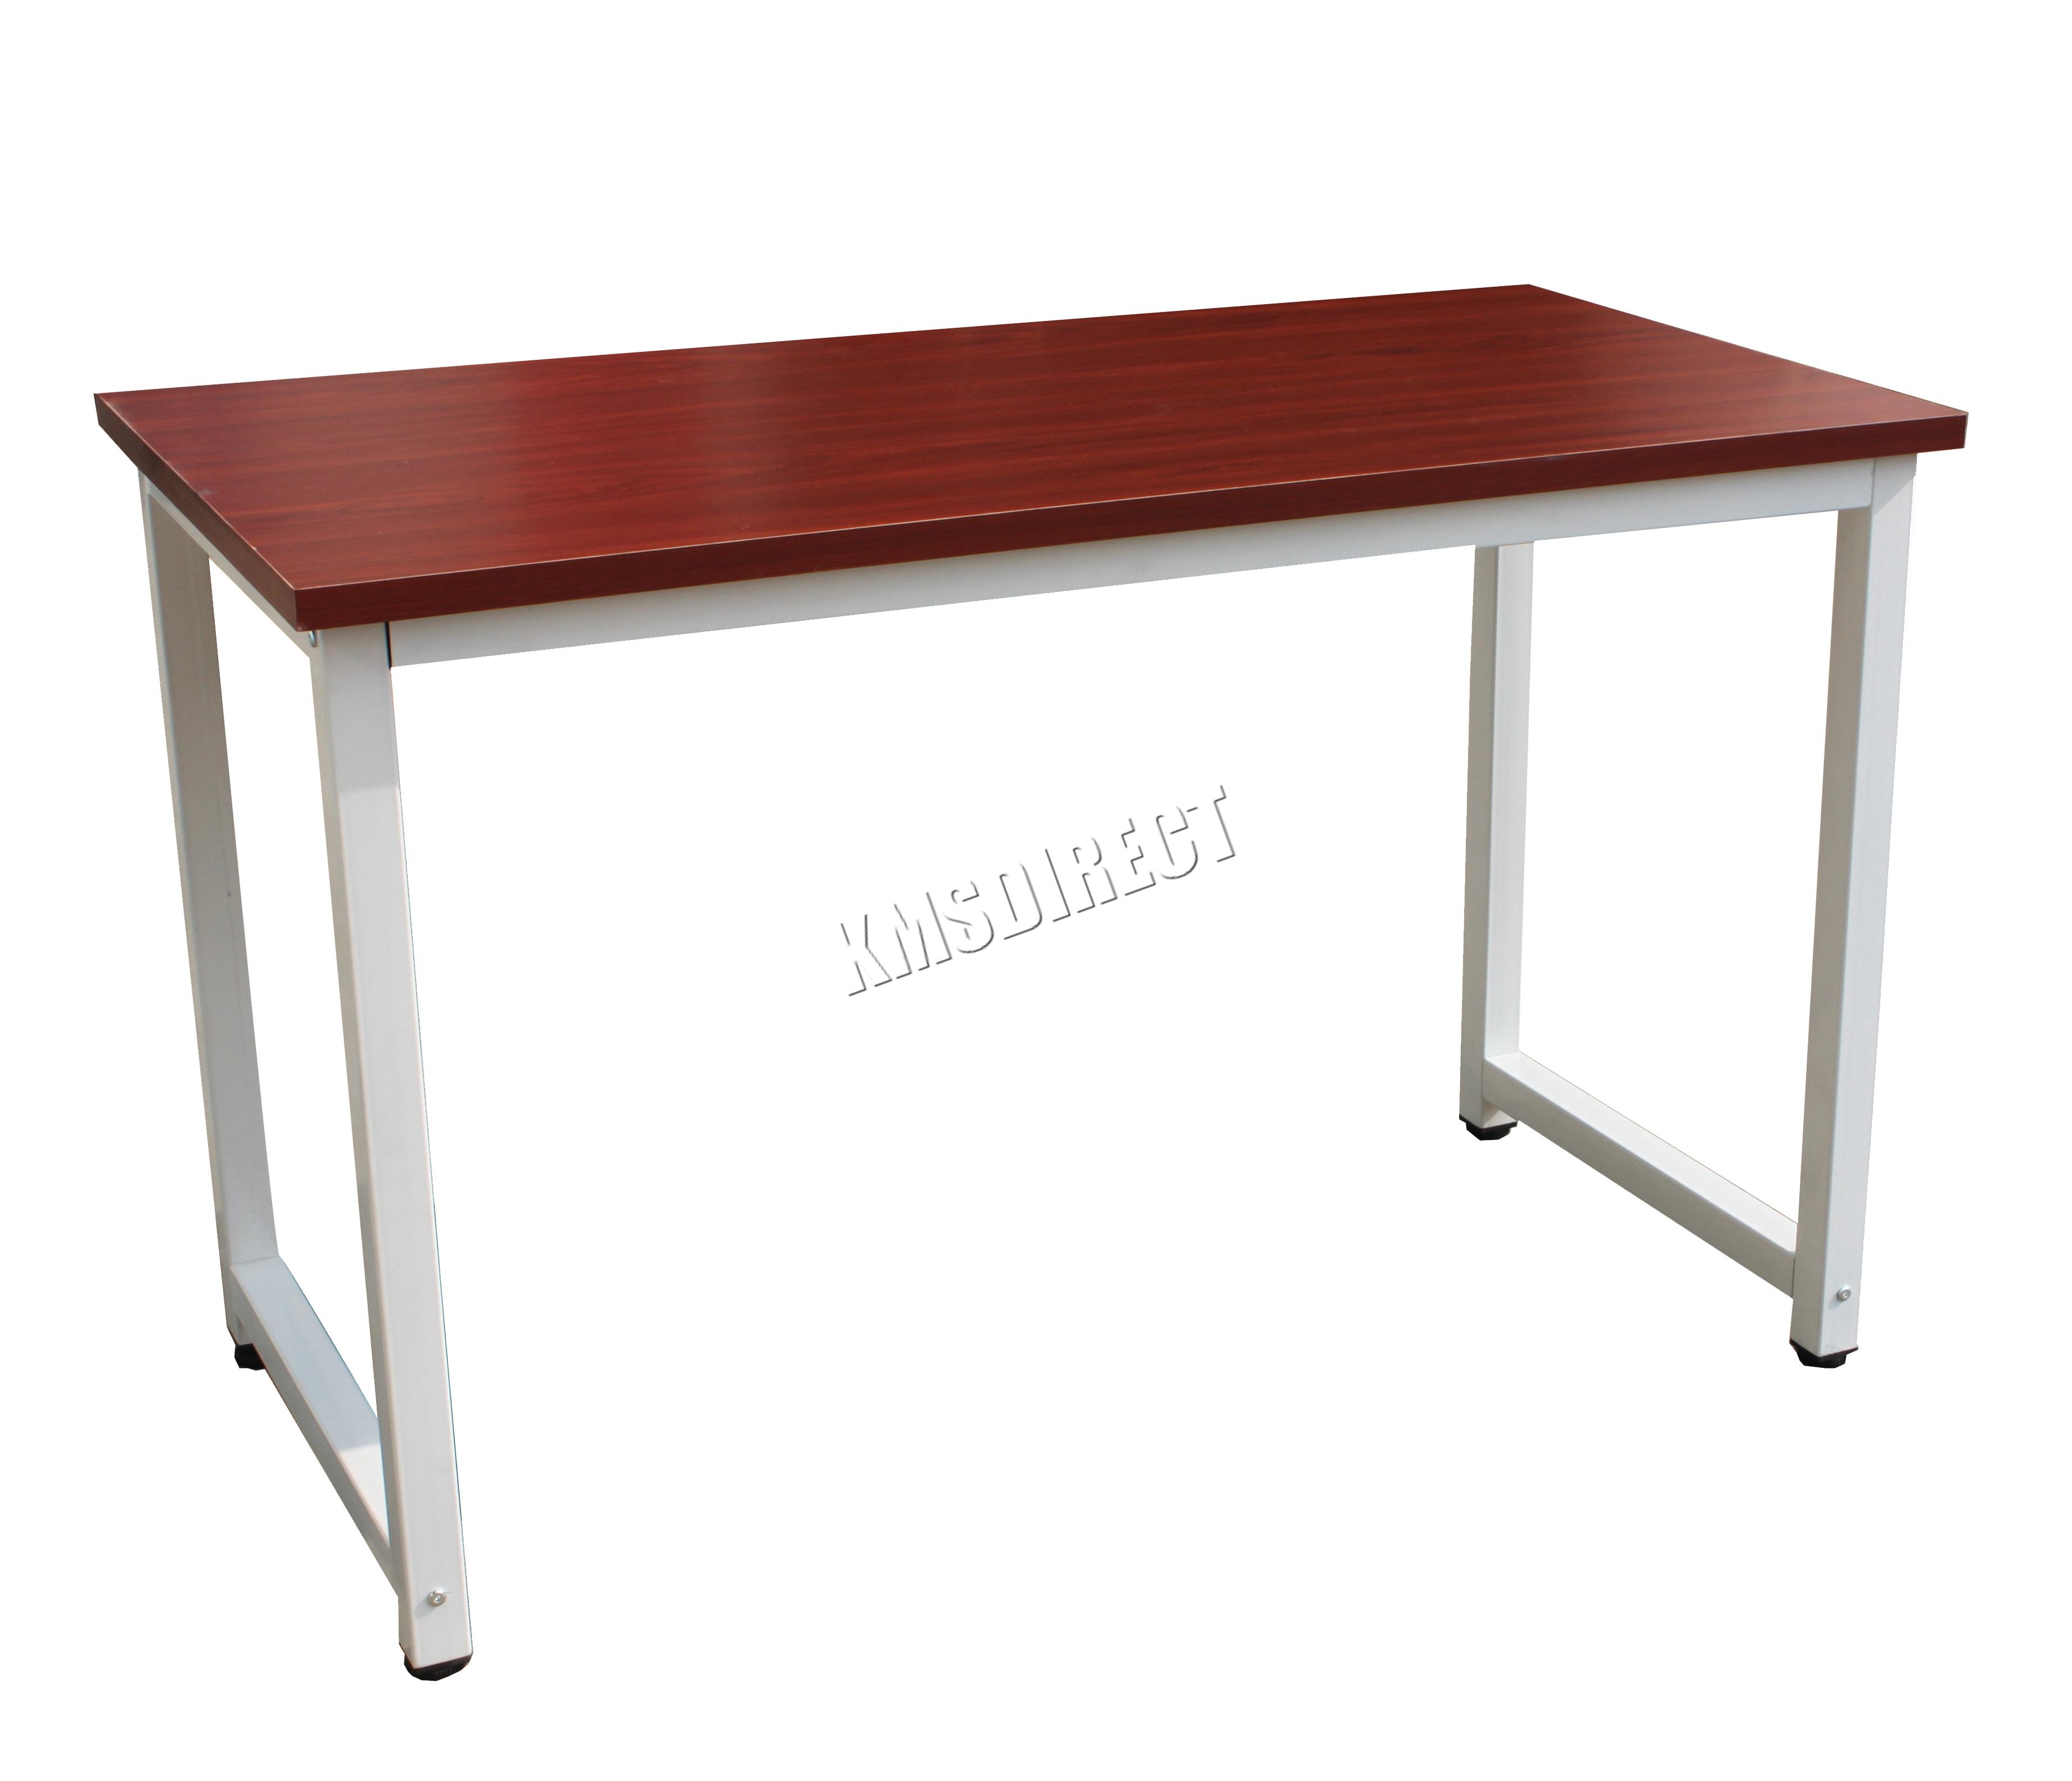 Teak computer desk computer desk mobile teak ct 7800 50 jesper mid century solid teak or - Teak office desk ...